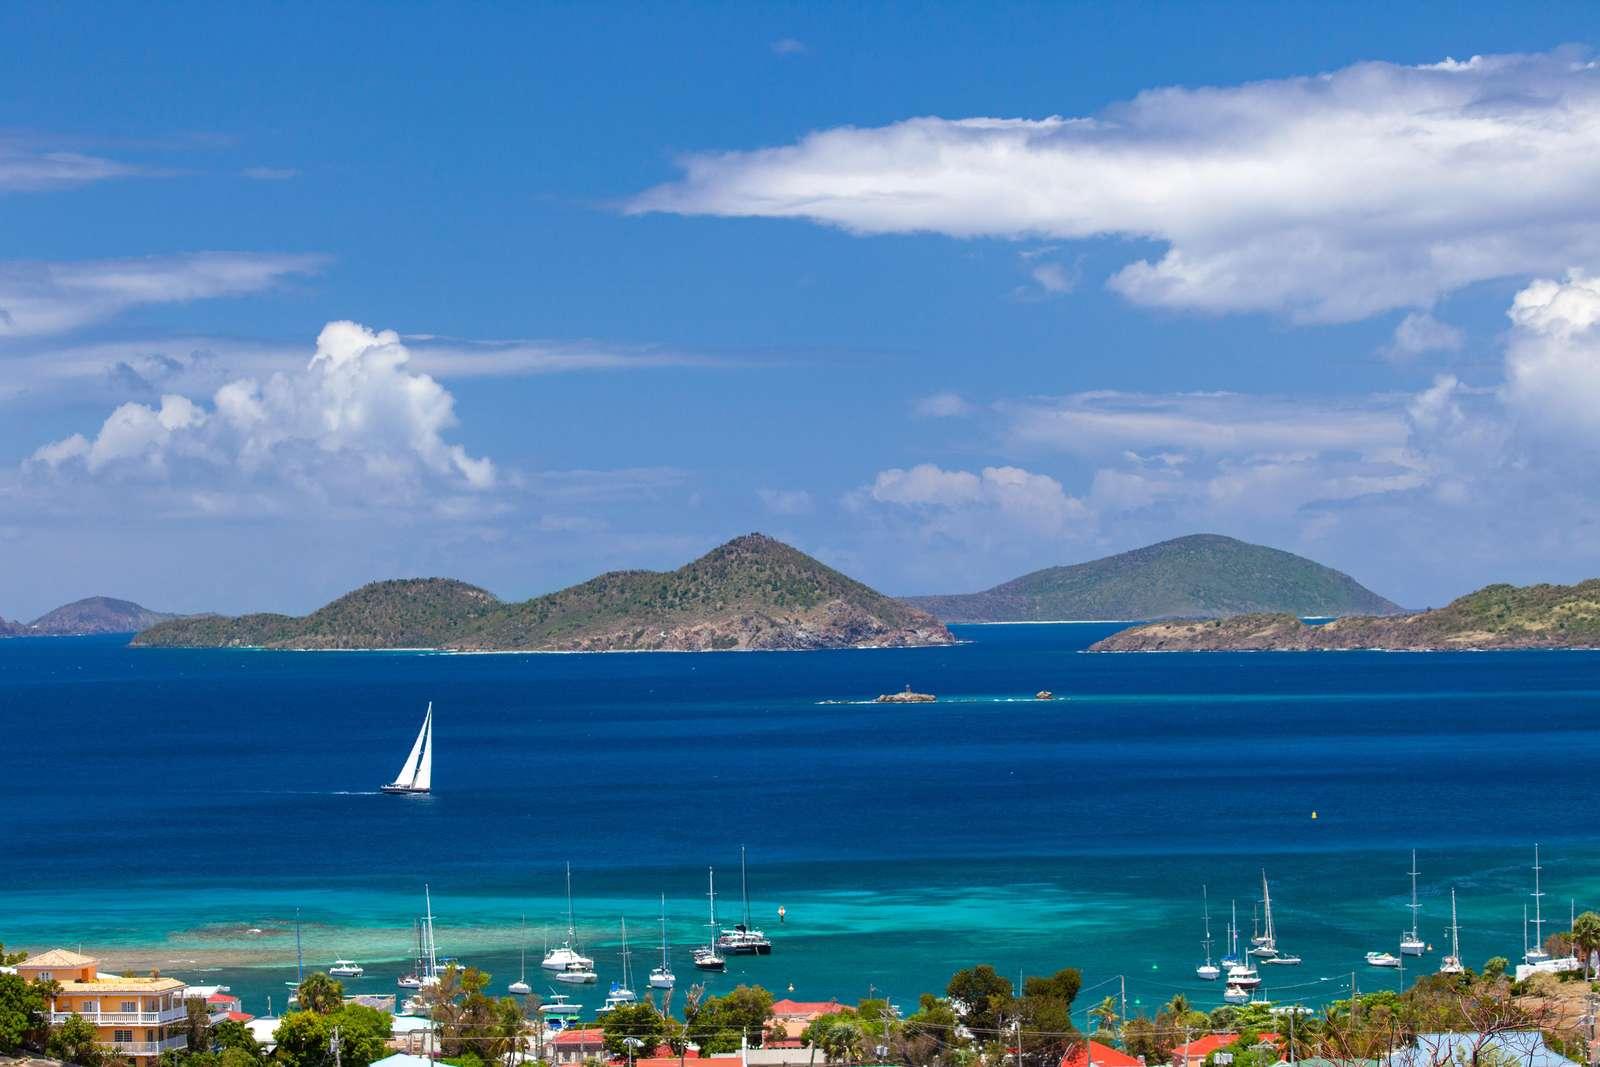 View of Caribbean Sea